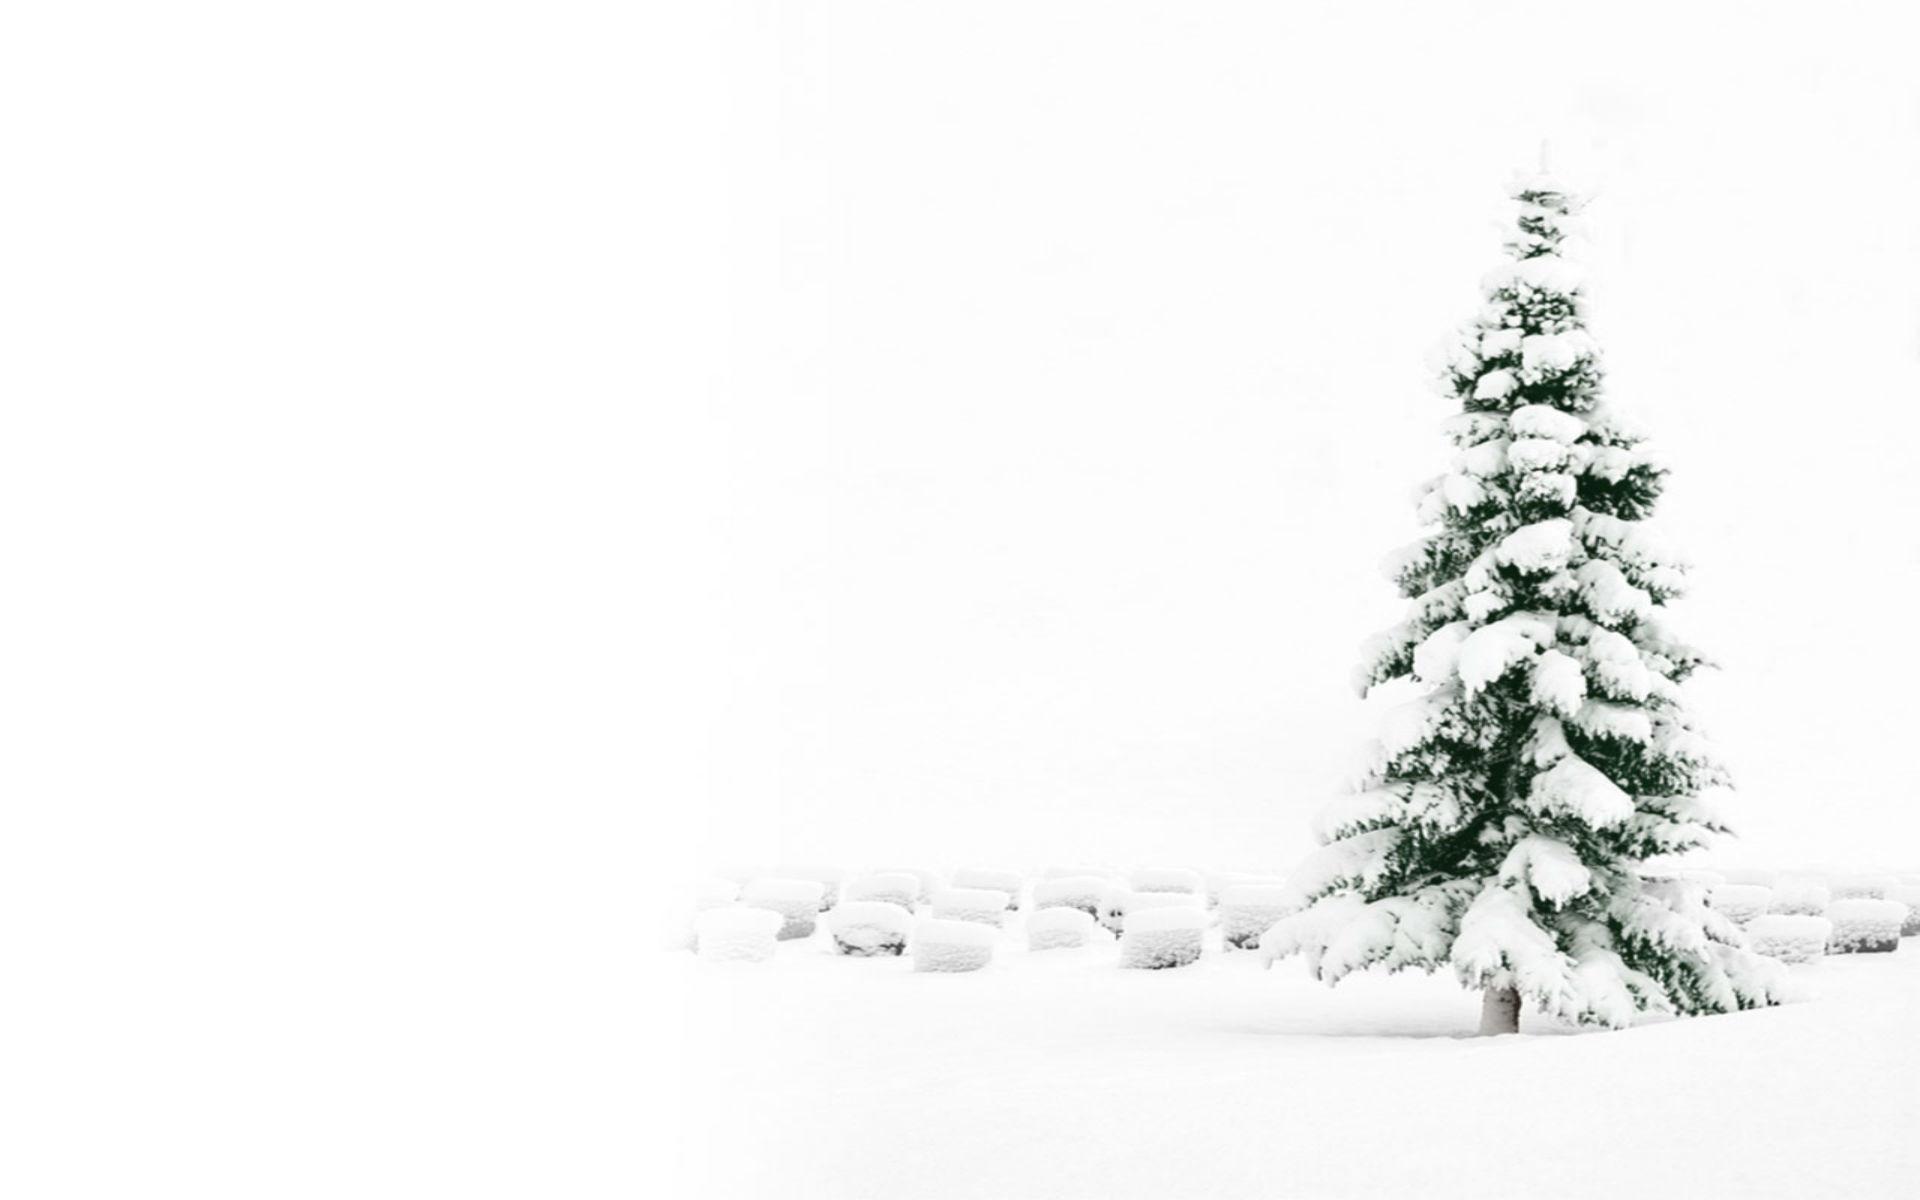 White Christmas Wallpaper 74 Images